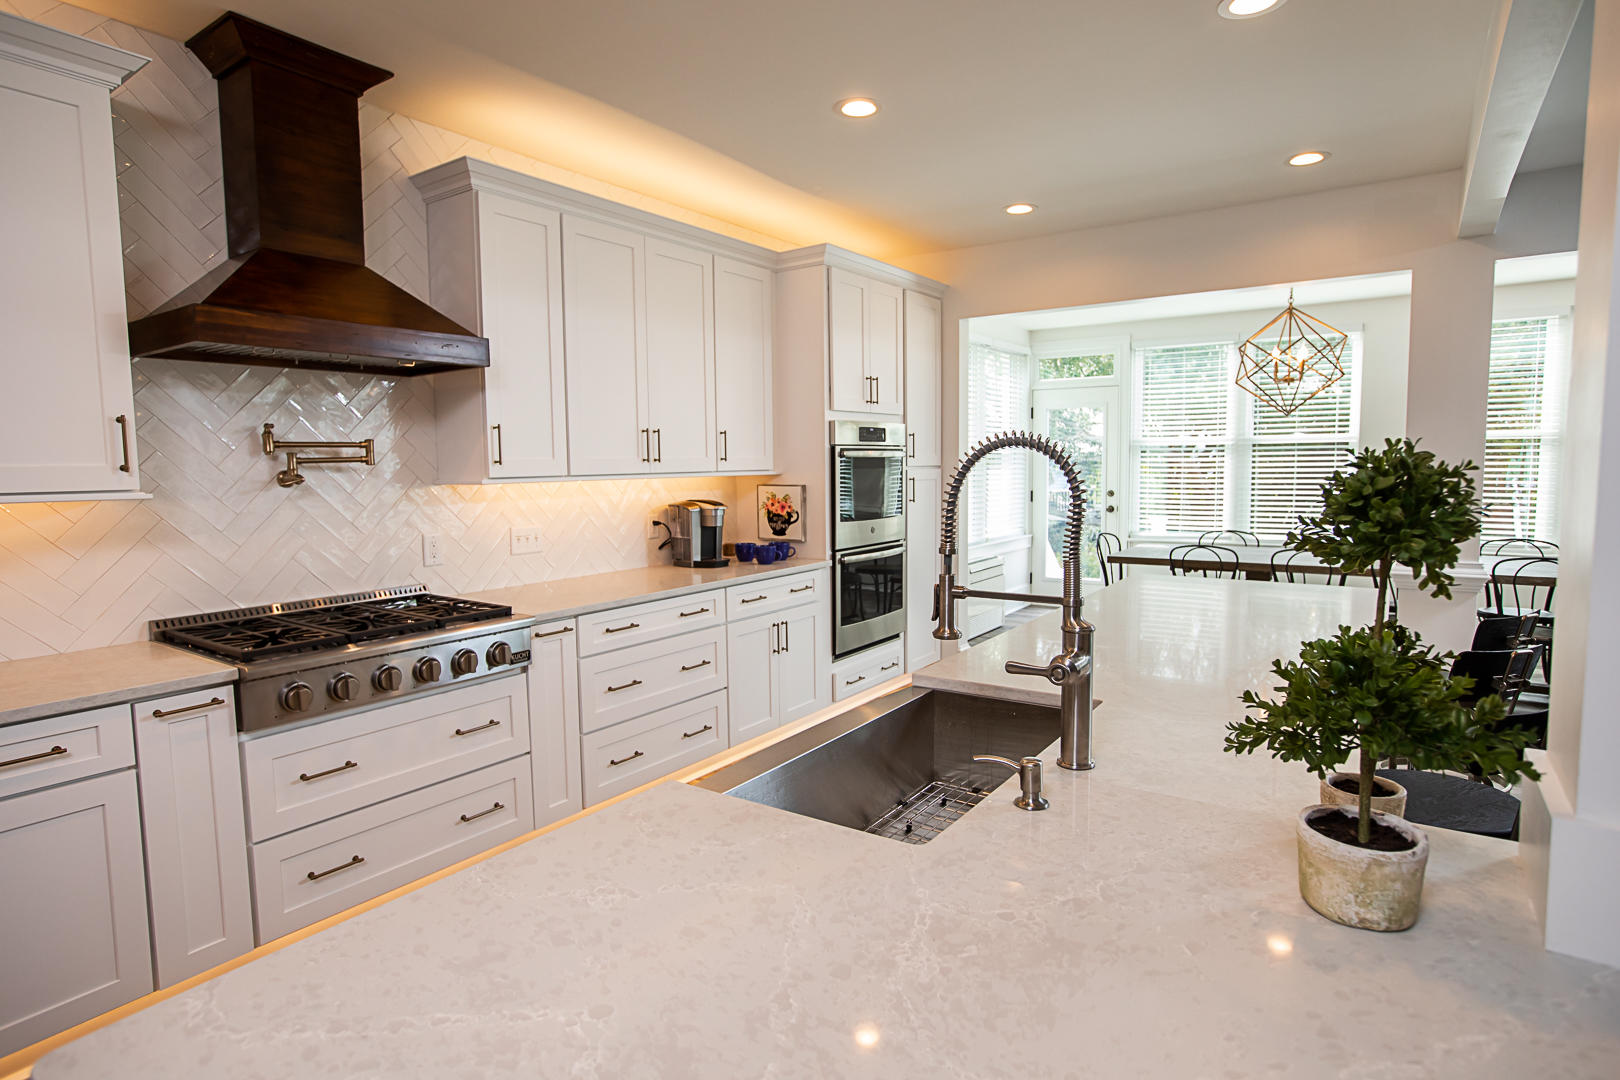 Isle of Palms Homes For Sale - 712 Carolina, Isle of Palms, SC - 10